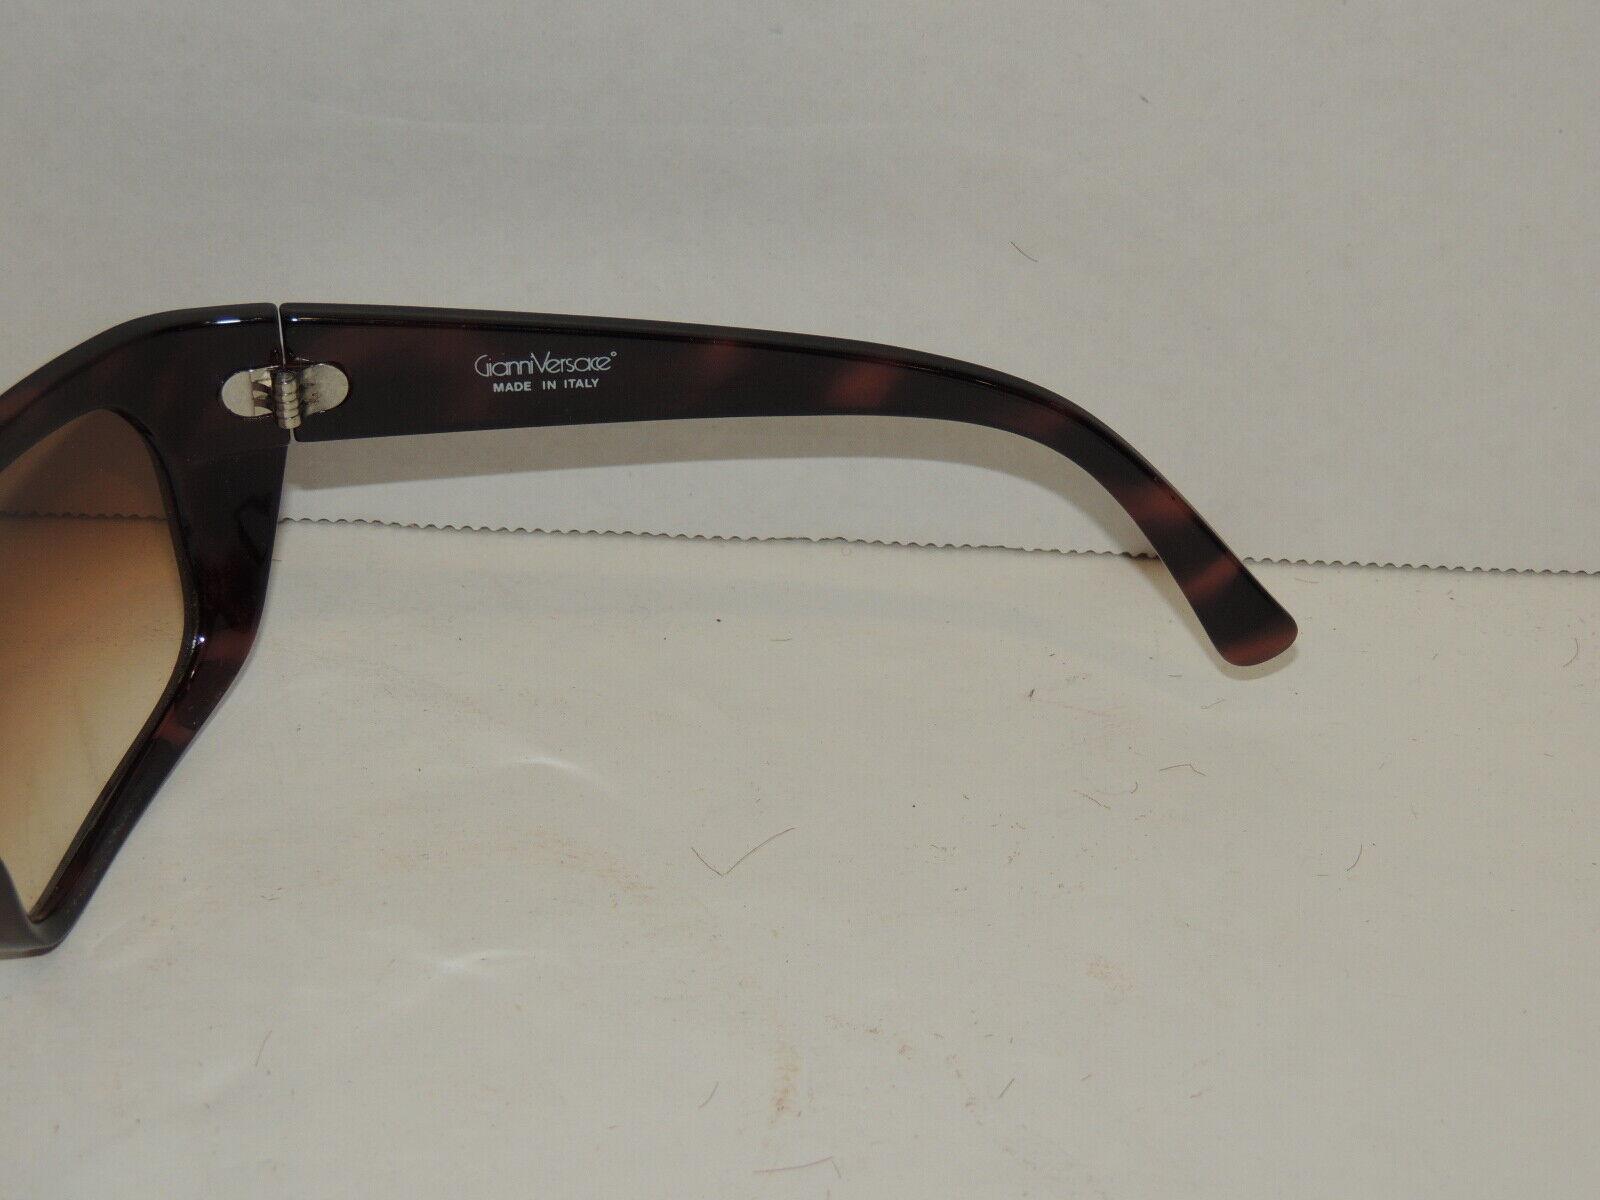 Gianni Versace Basix Brown Sunglasses  - image 4